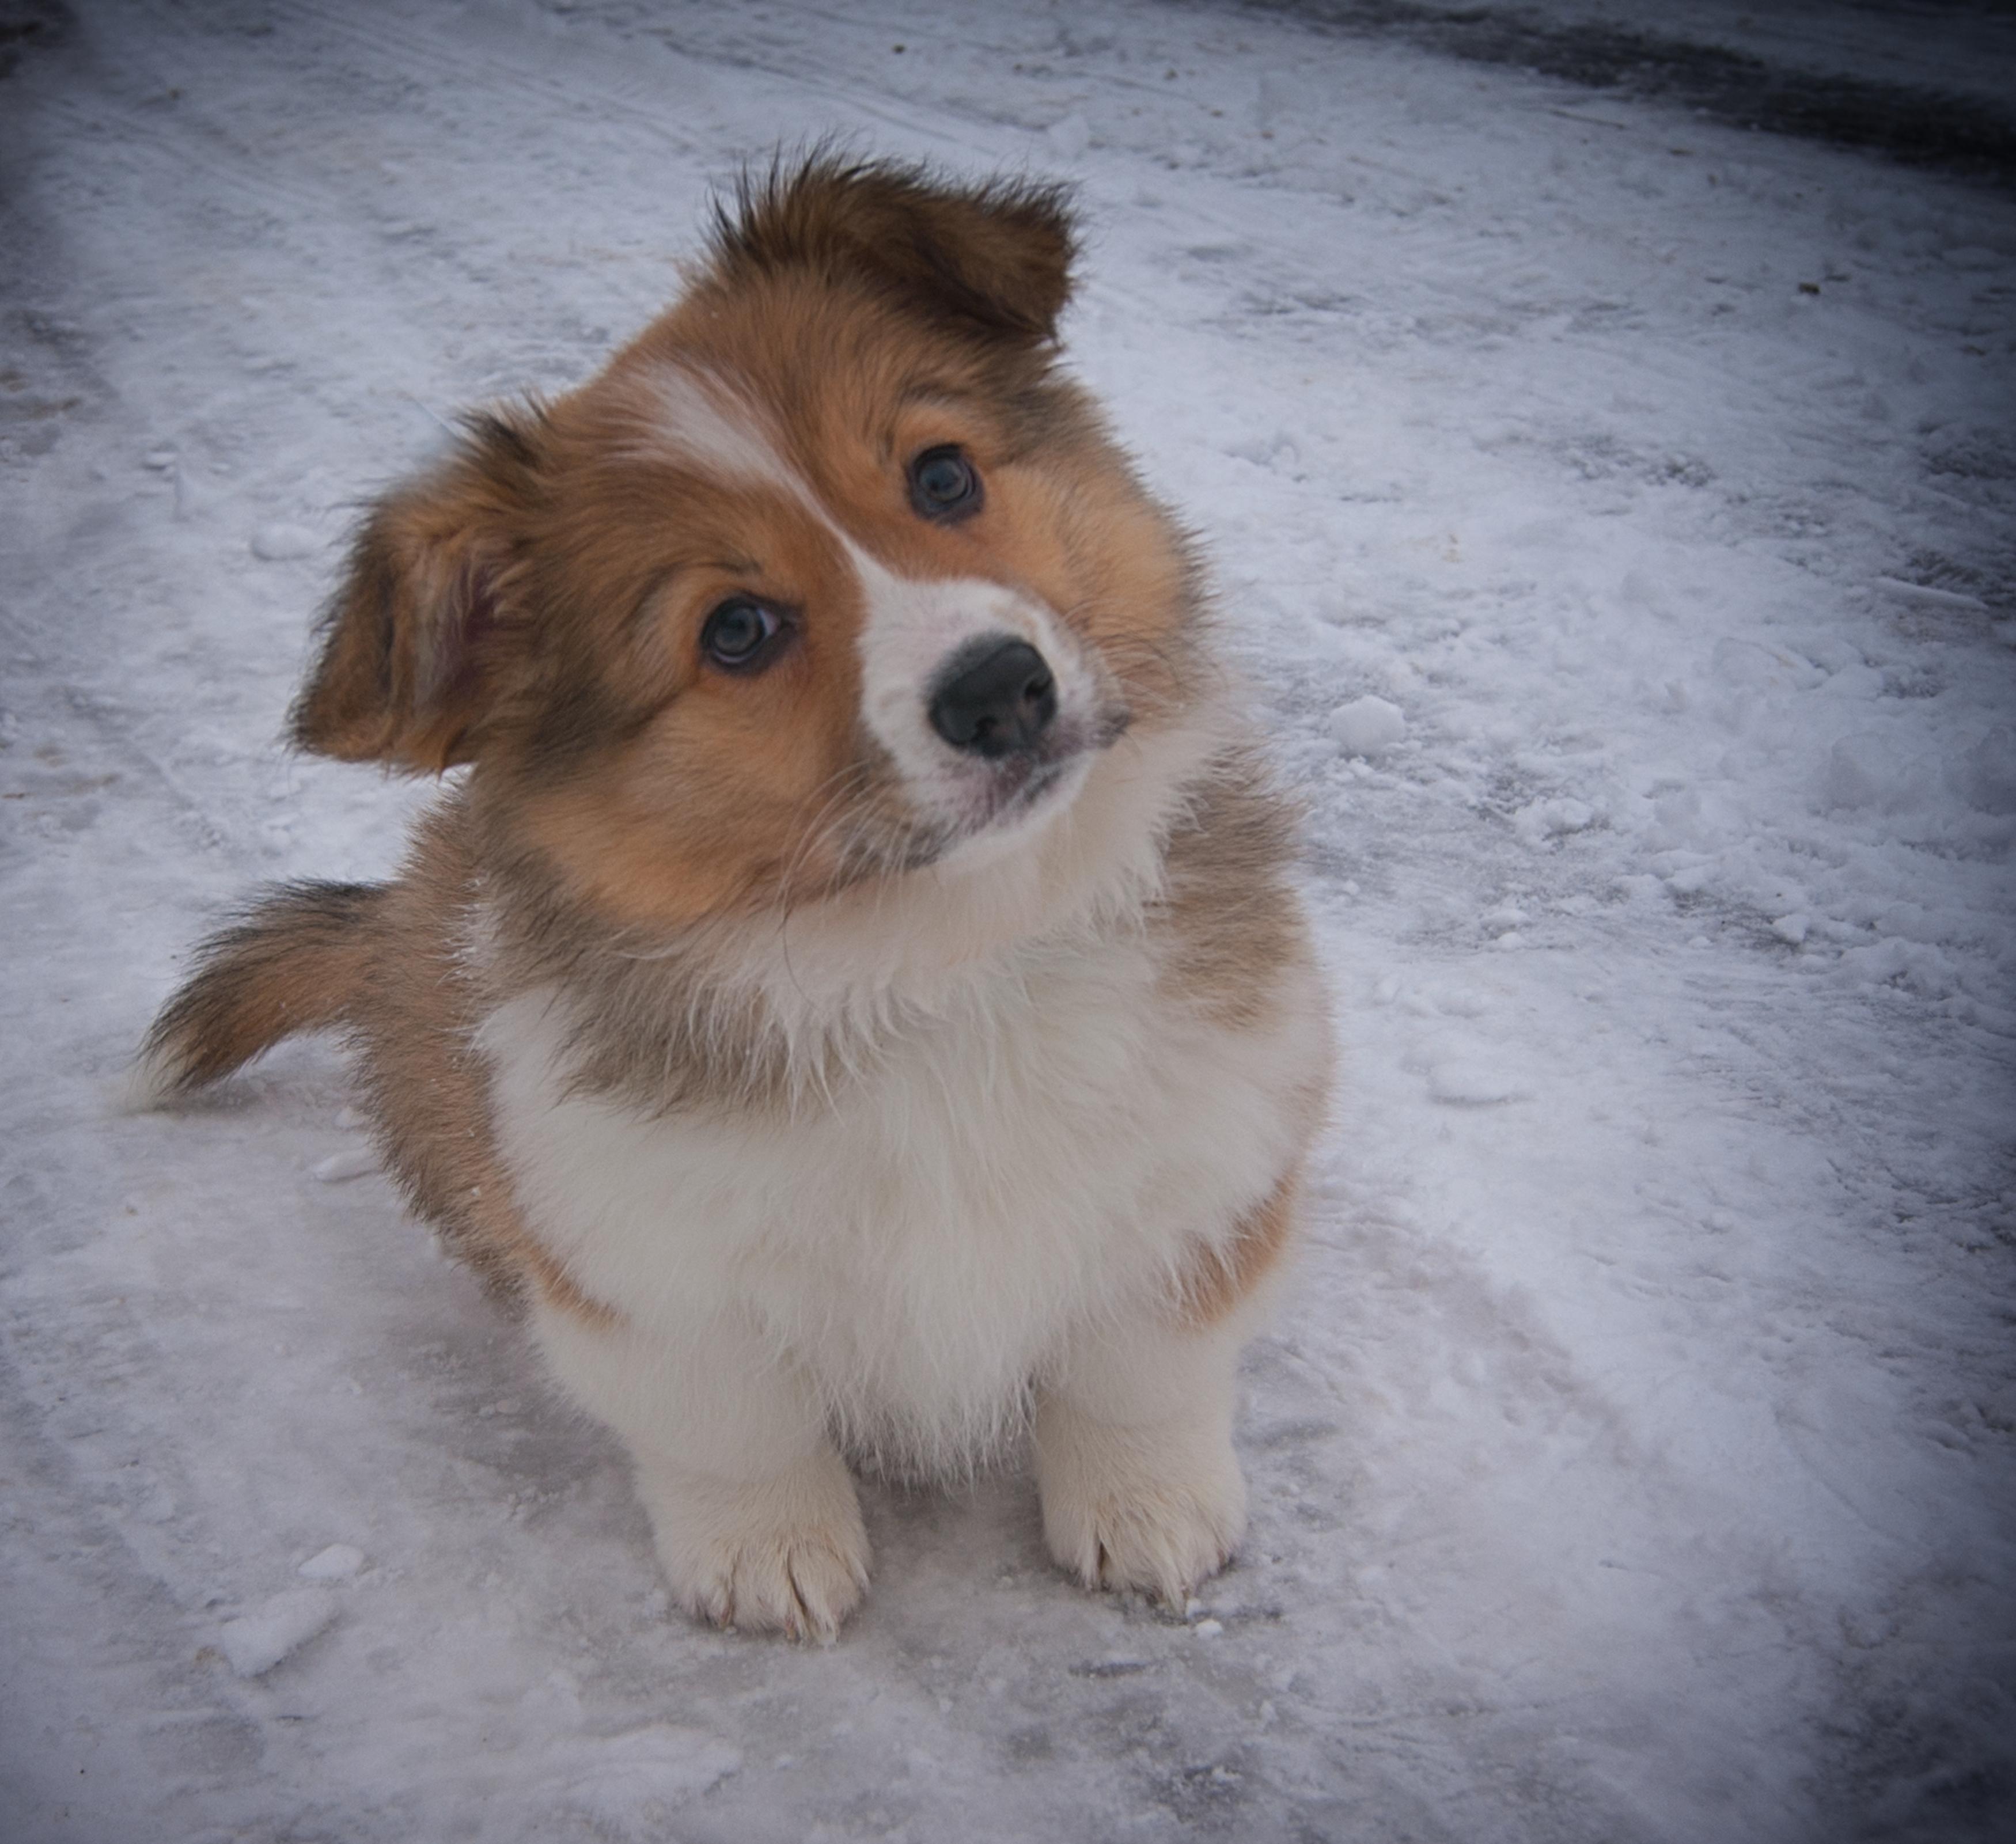 Free Images Puppy Snow Dog Like Mammal Dog Breed Dog Breed